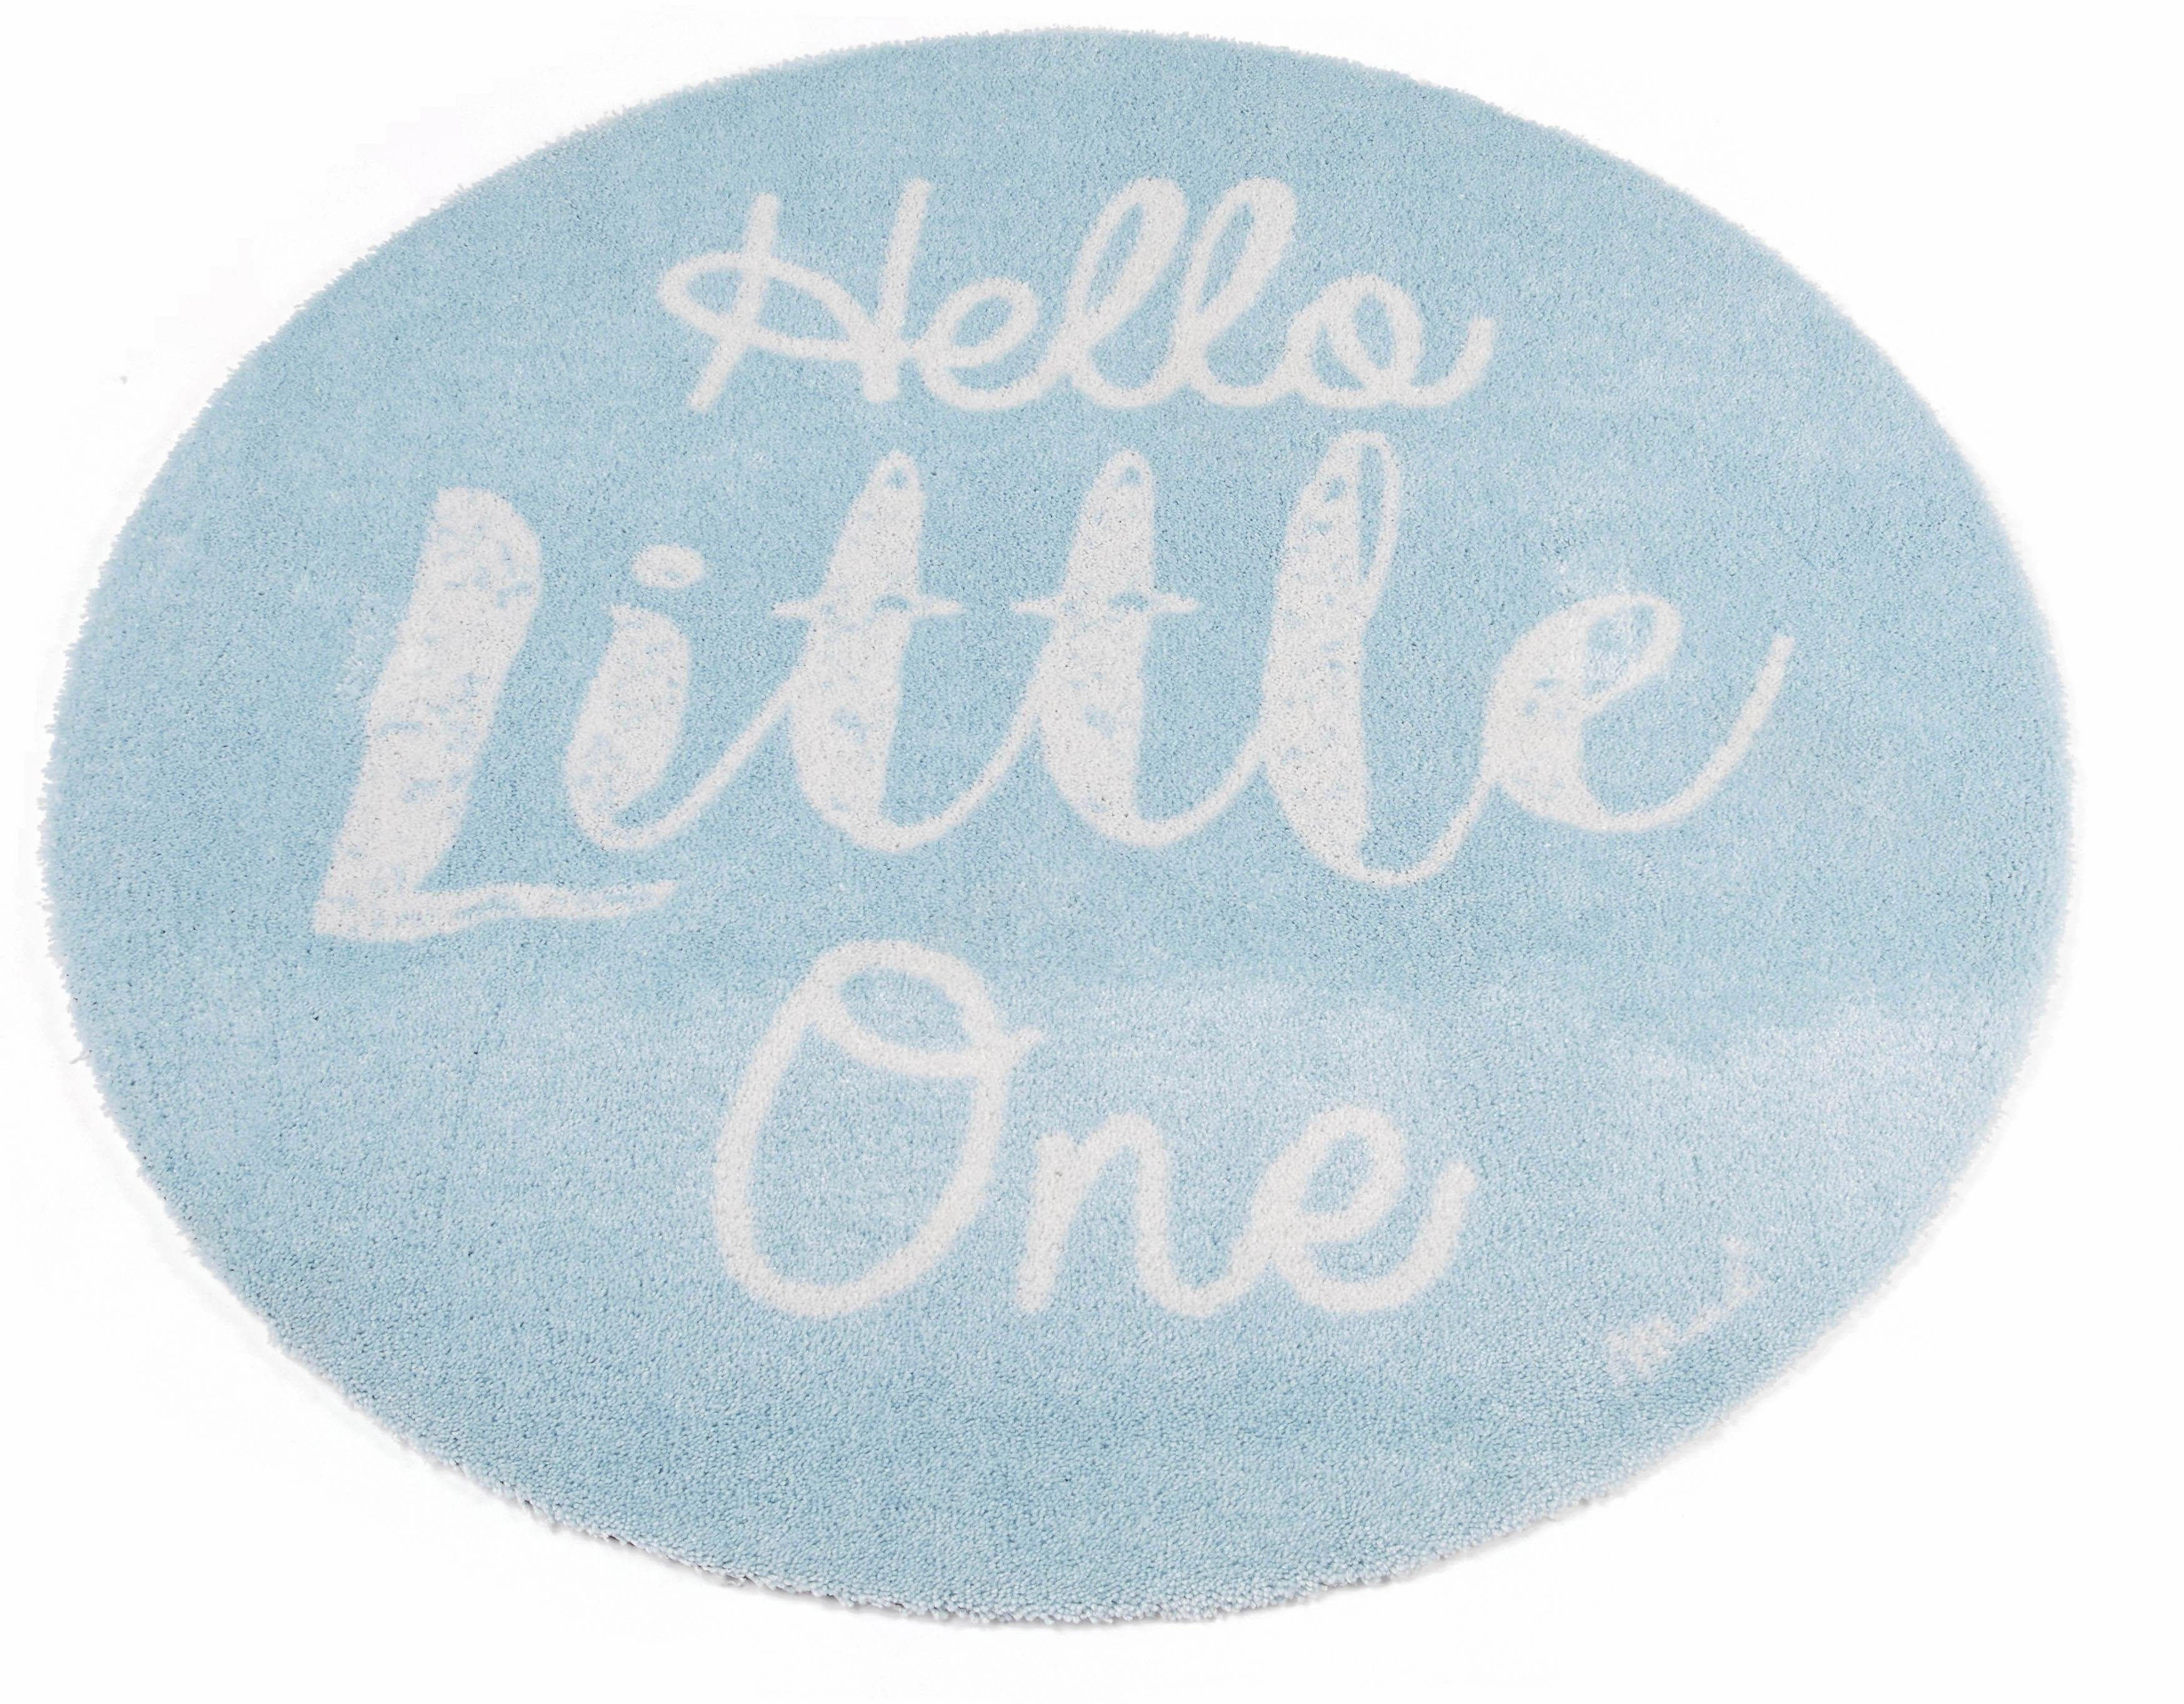 Rond Vloerkleed Kinderkamer : Vloerkleed kinderkamer elegant vloerkleed kinderkamer clouds